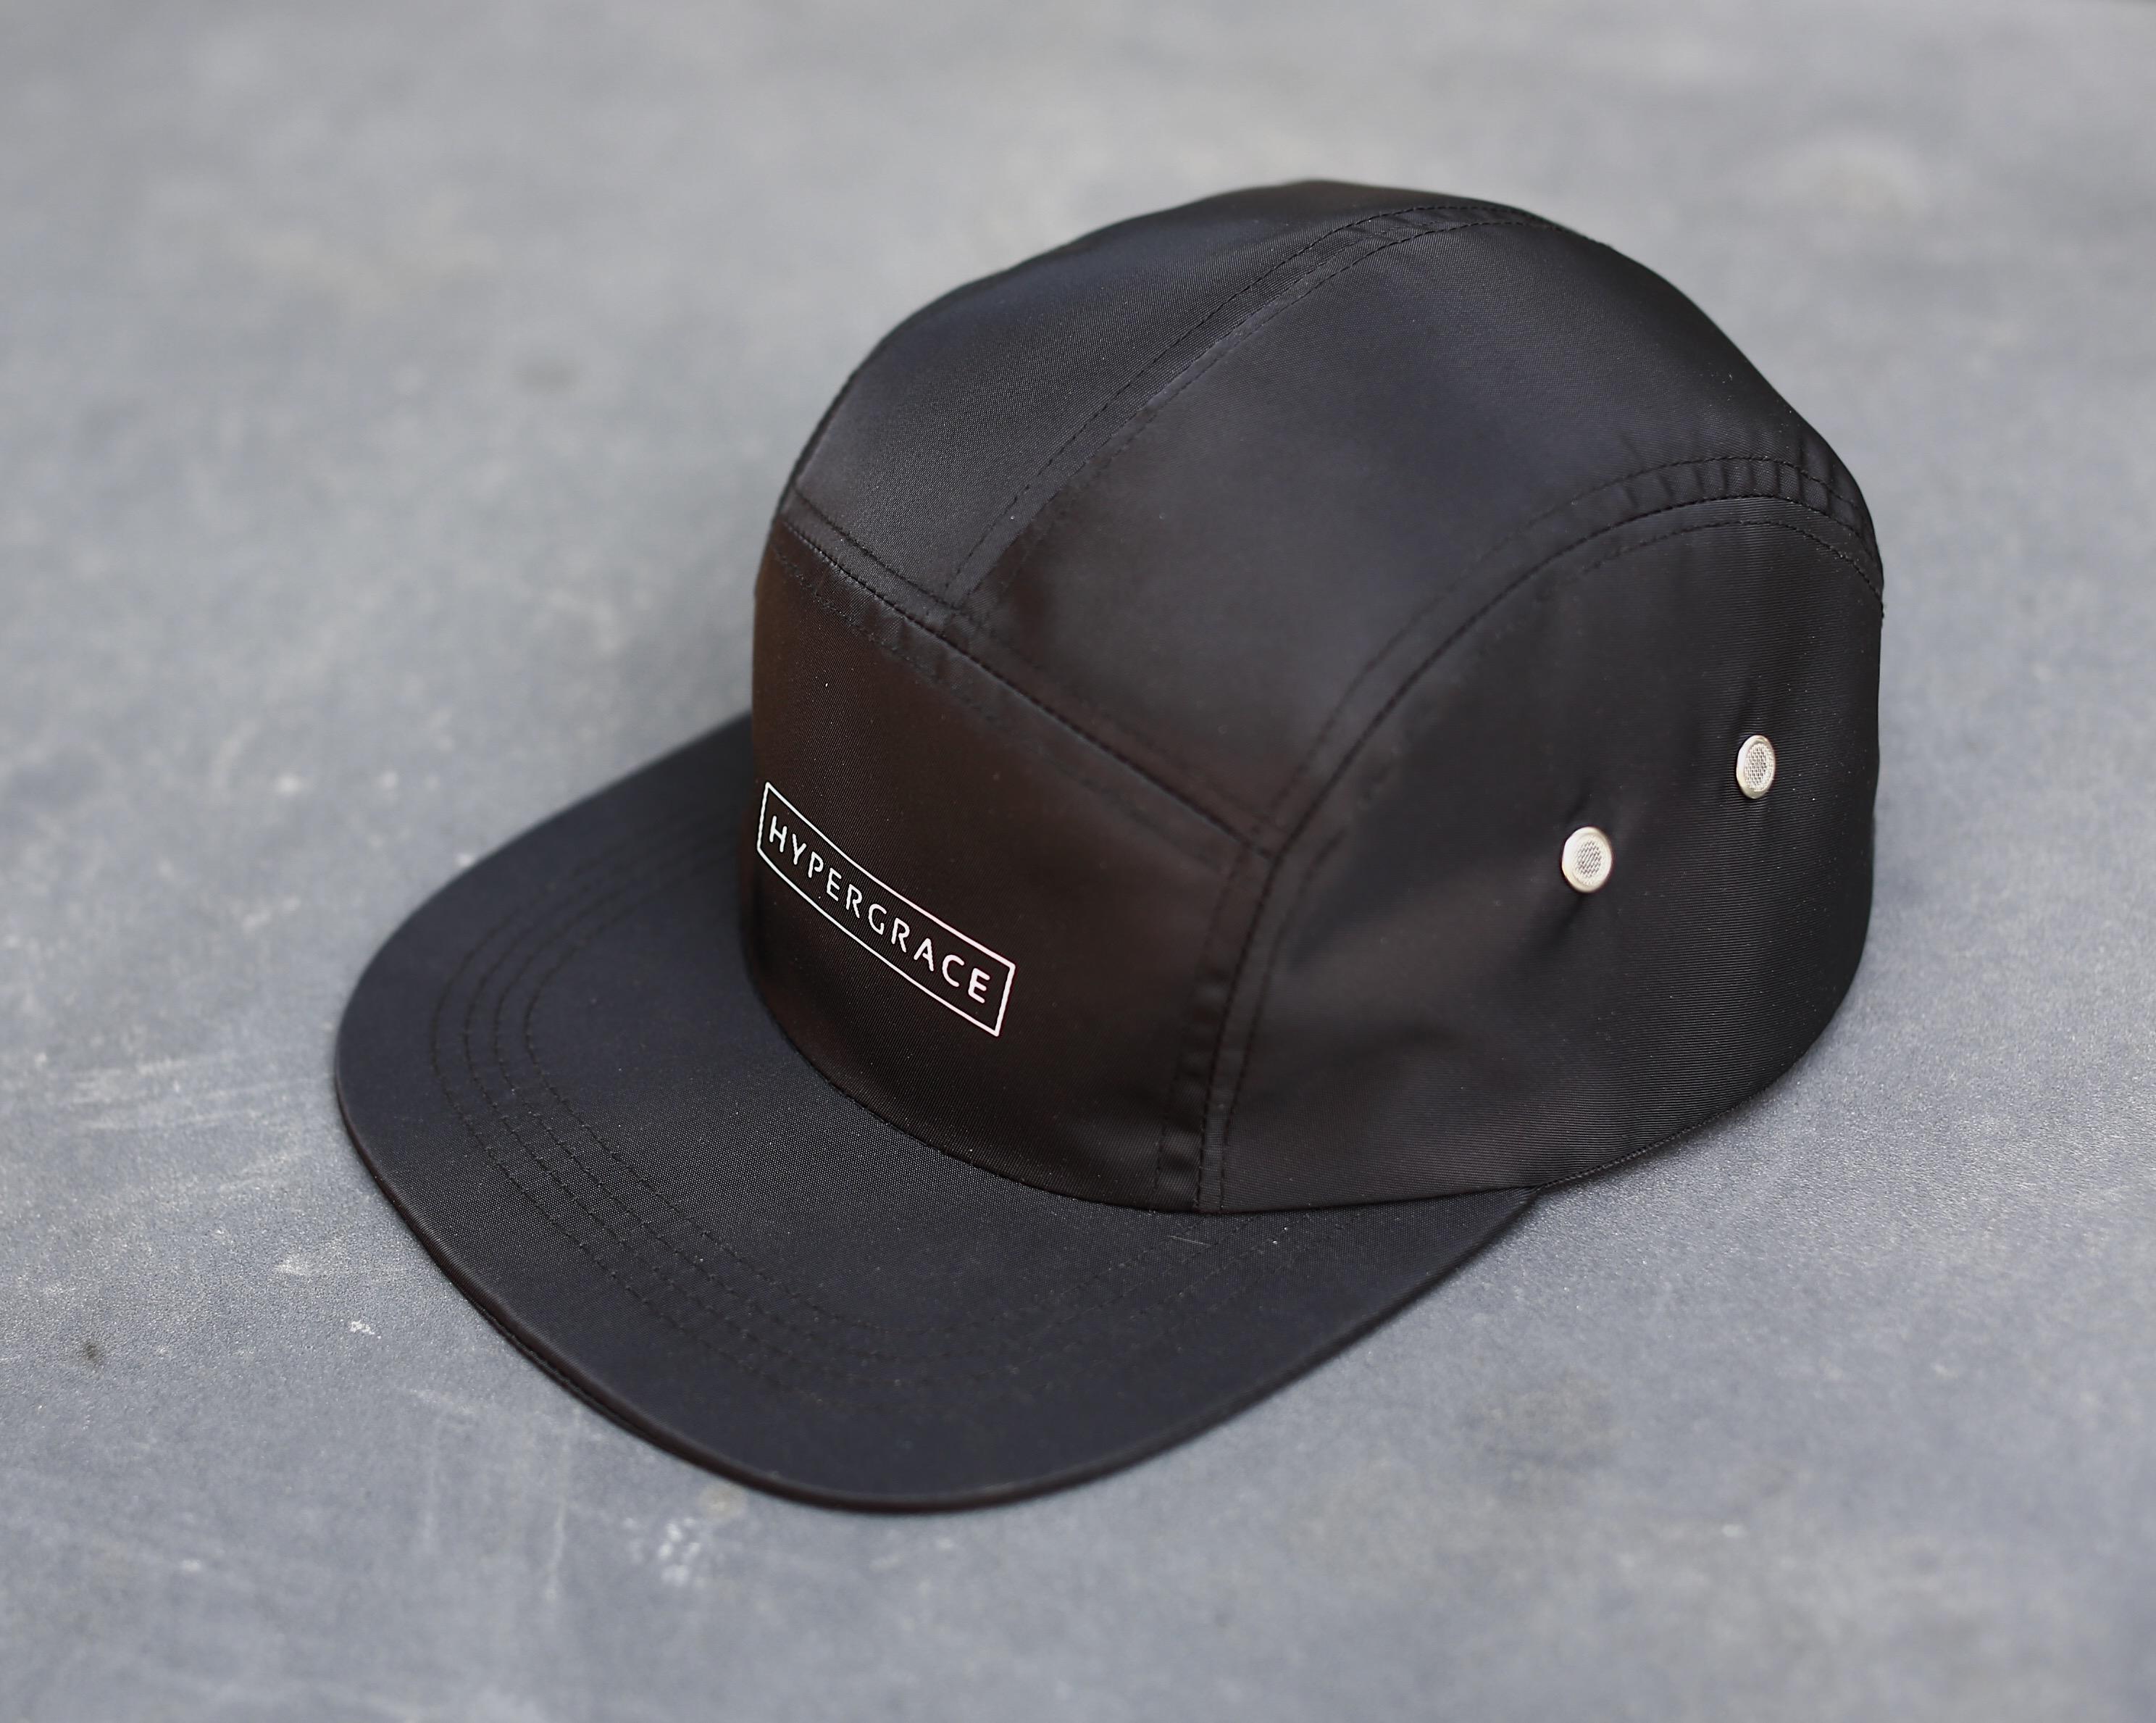 34fca51acb HYPERGRACE five piece cap waterproof nylon CAMP CAP 5-Panel shade baseball  five piece cap